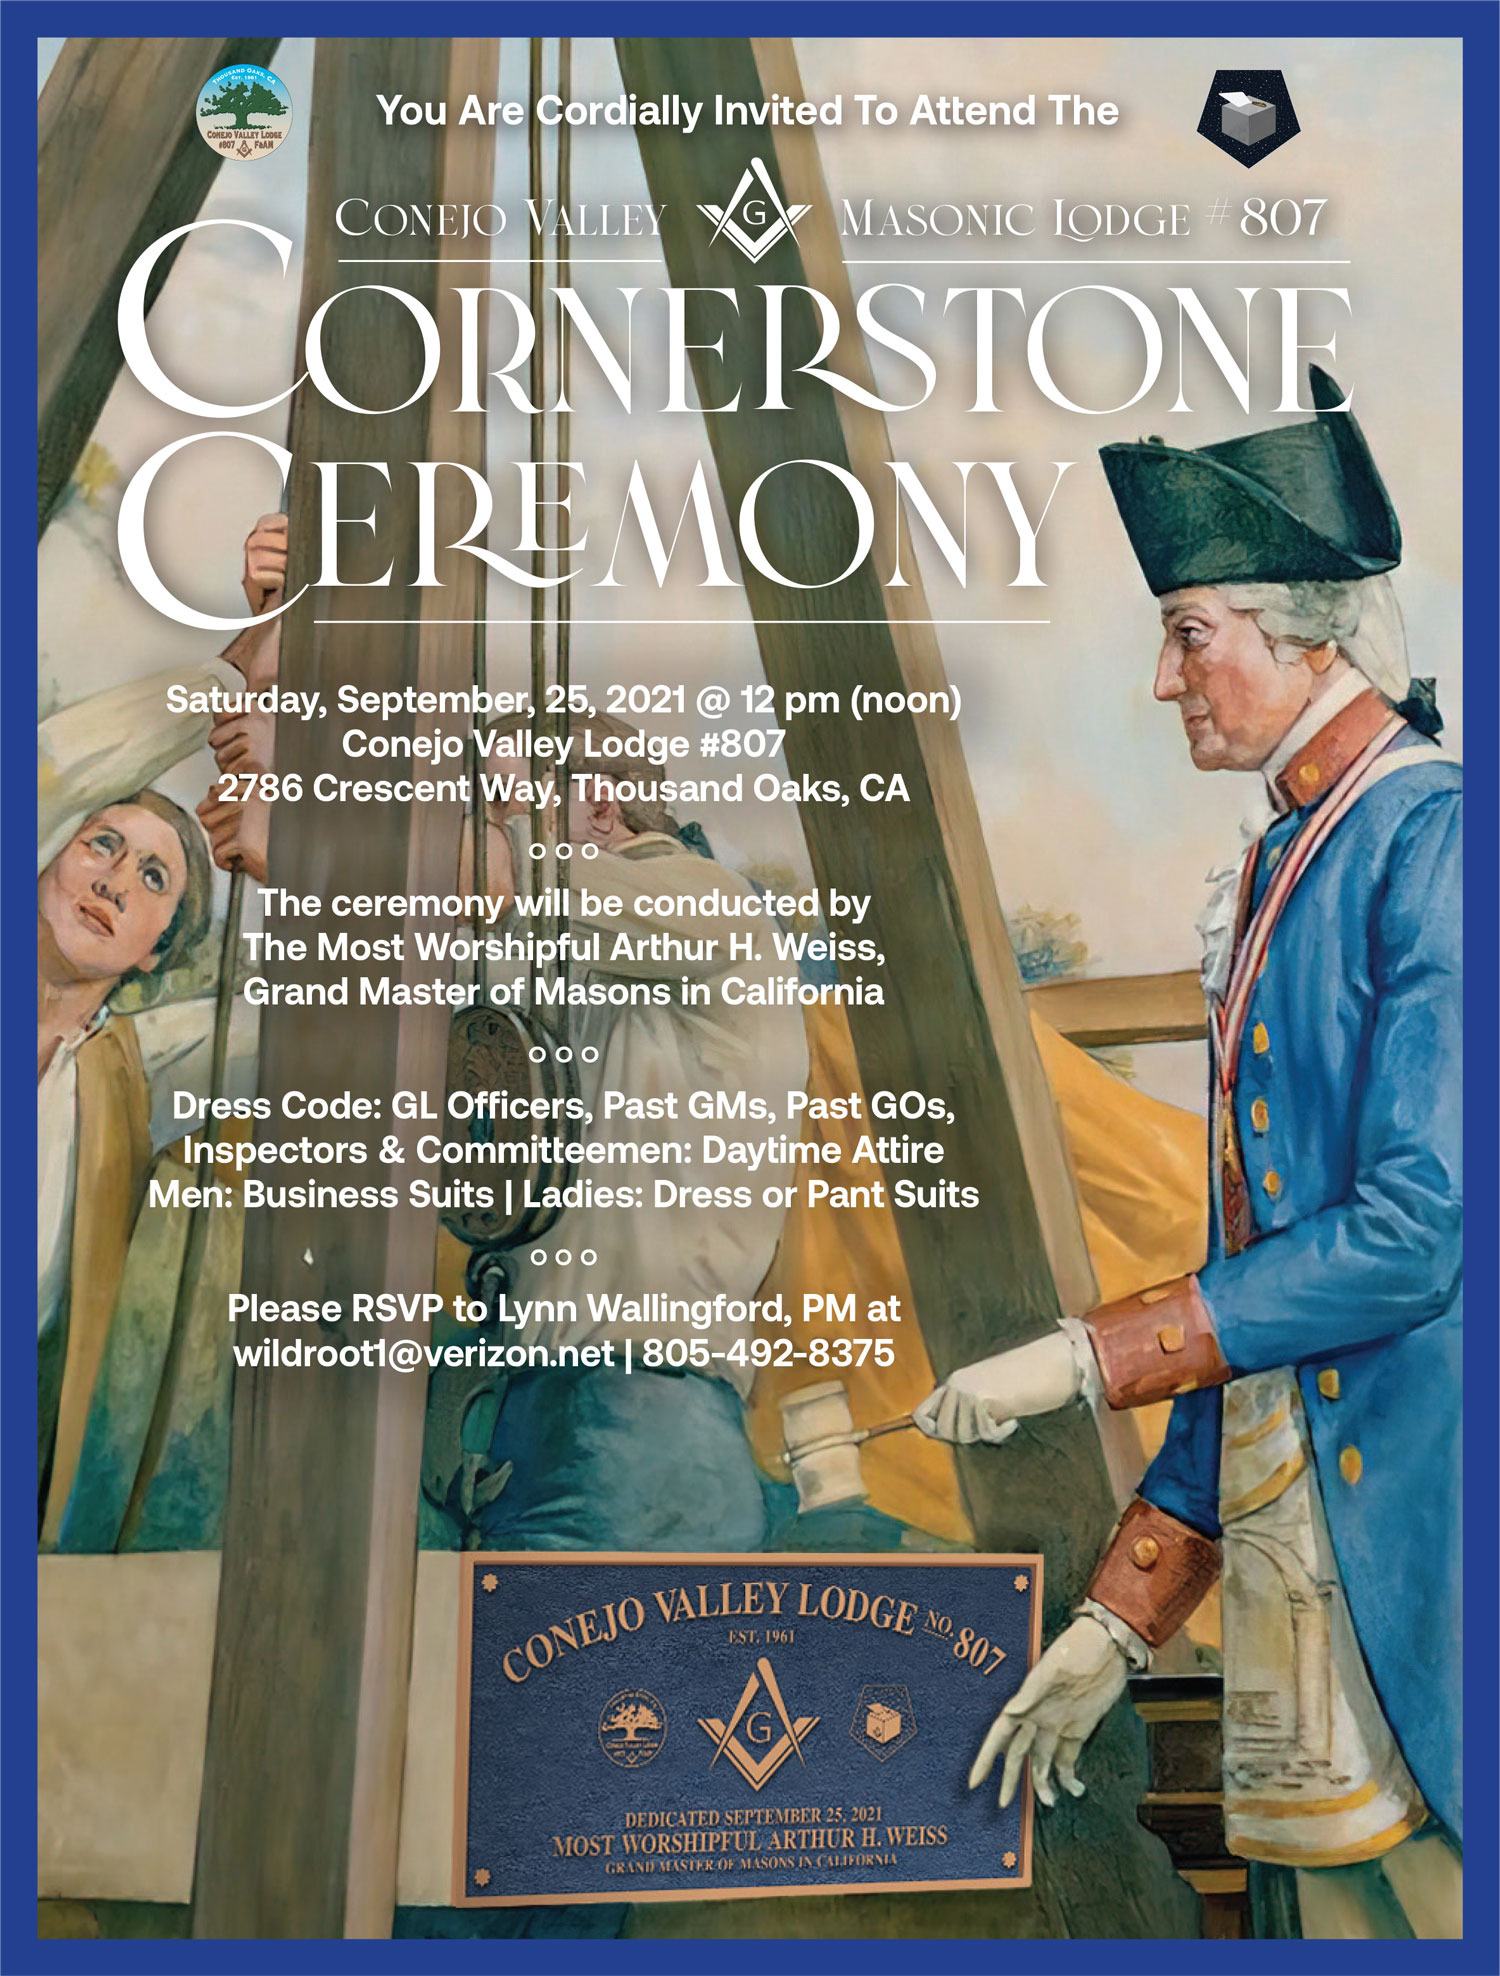 Cornerstone Ceremony at Conejo Valley Lodge's photo'